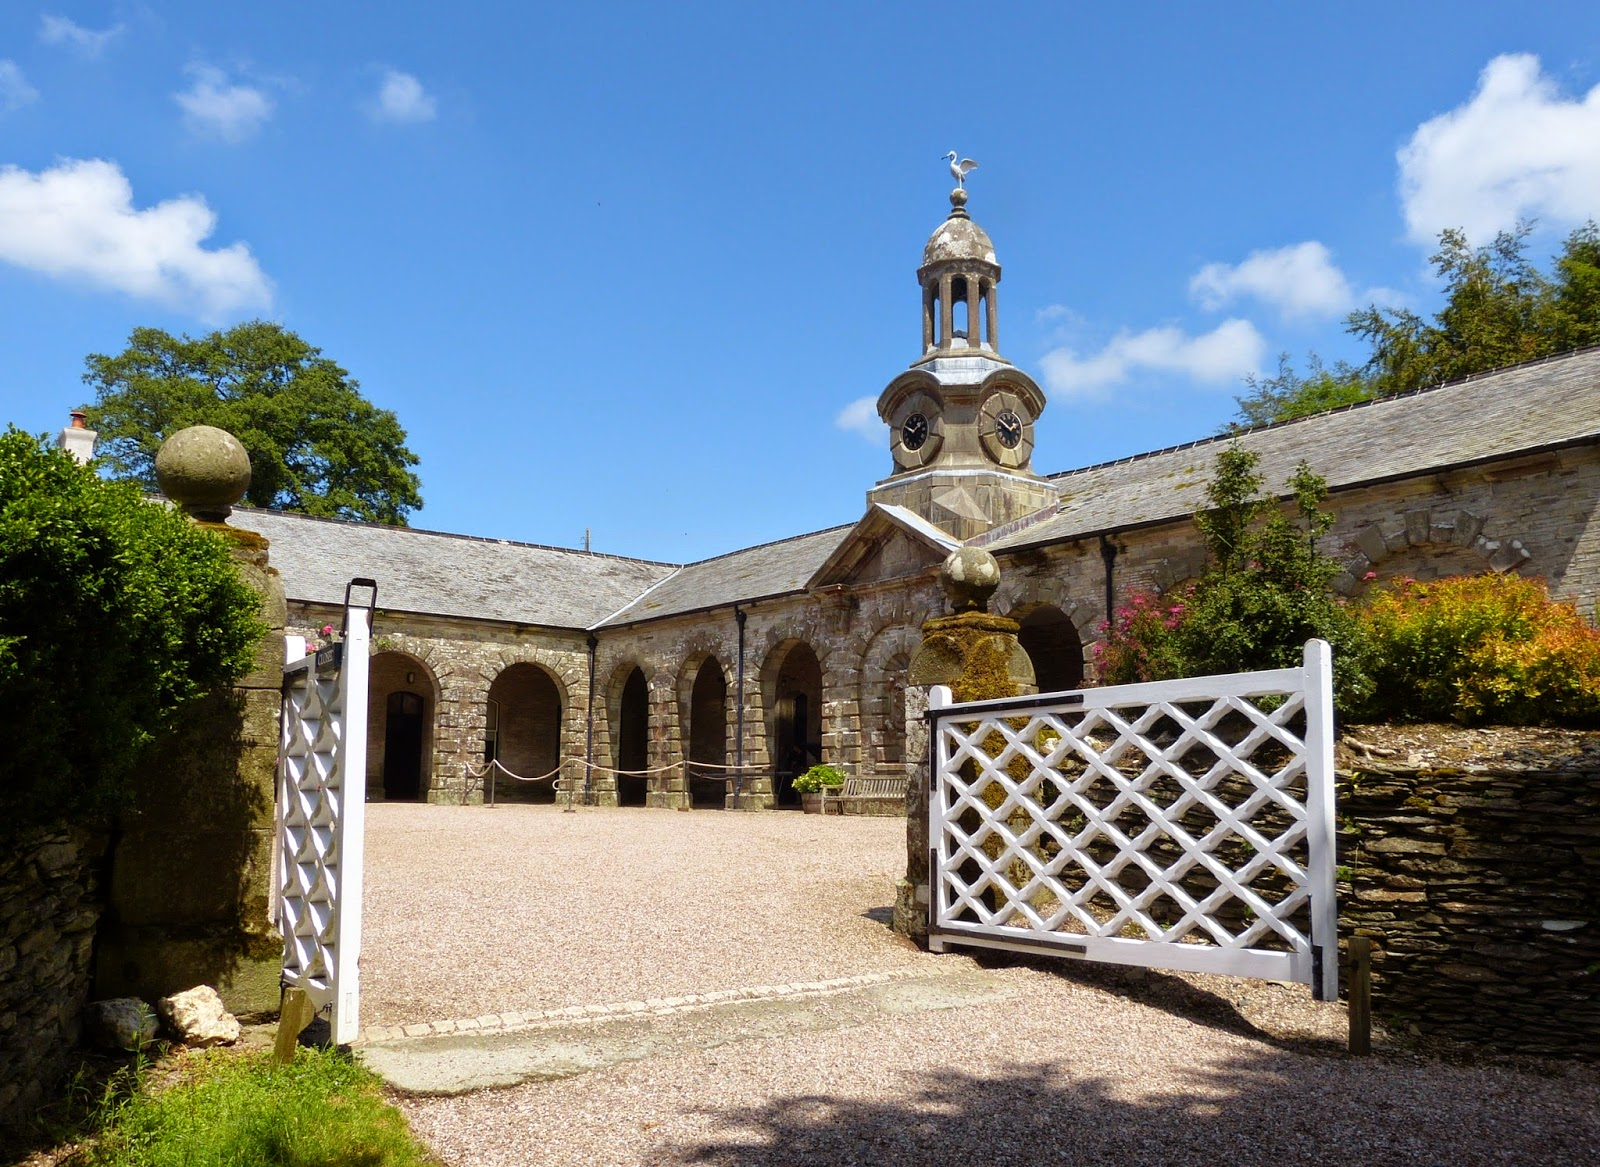 The stables, Arlington Court